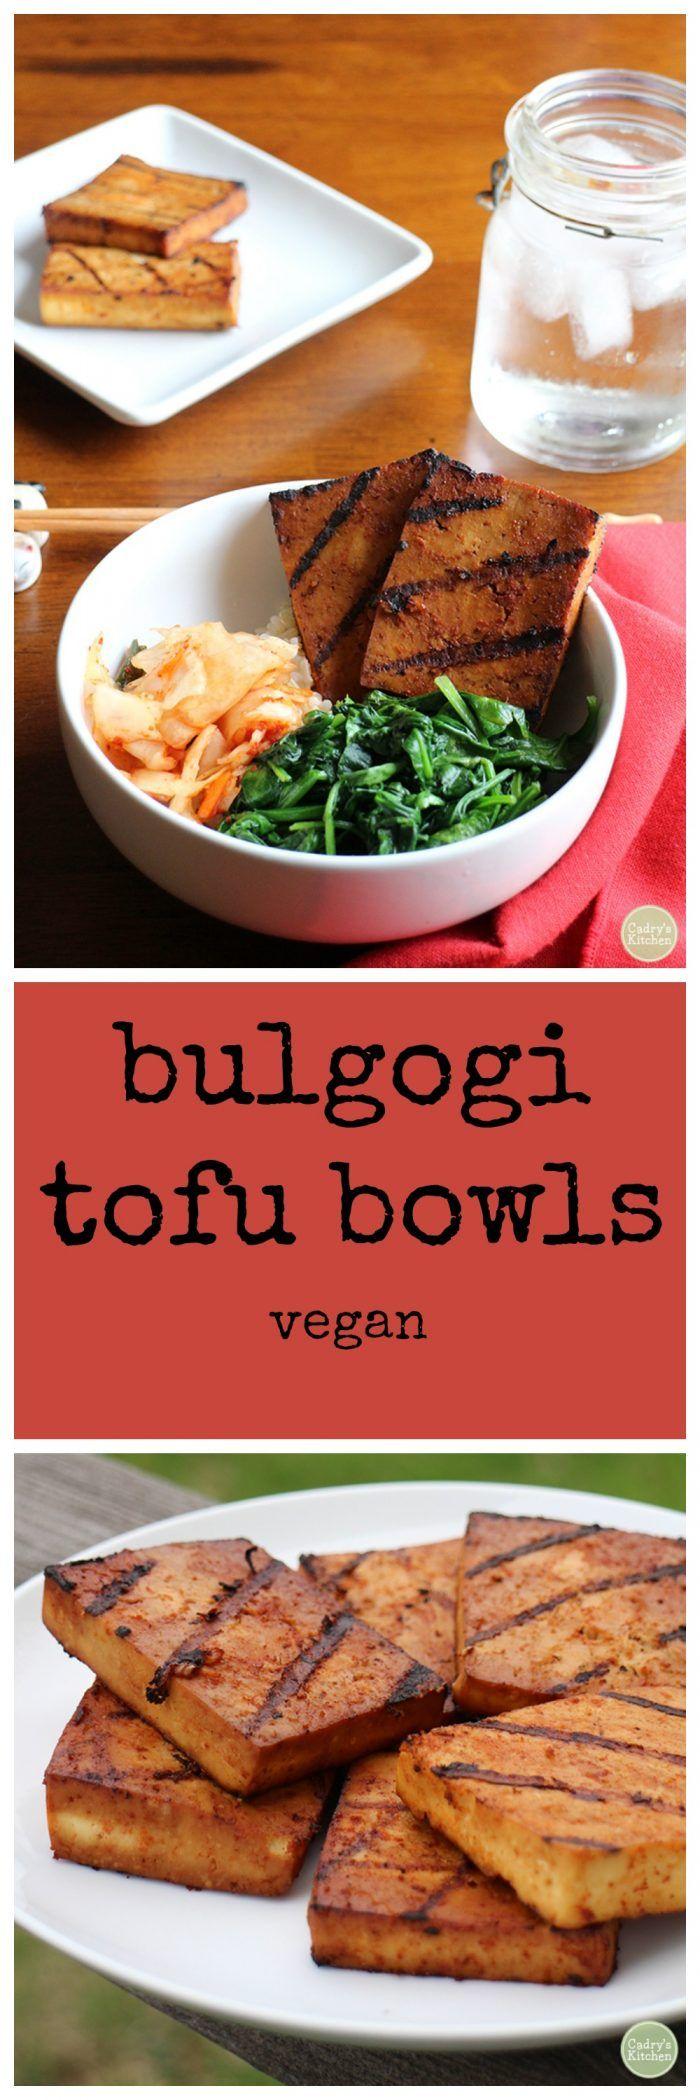 Bulgogi Tofu Bowls | Recipe | Vegan dinner recipes, Vegan ...